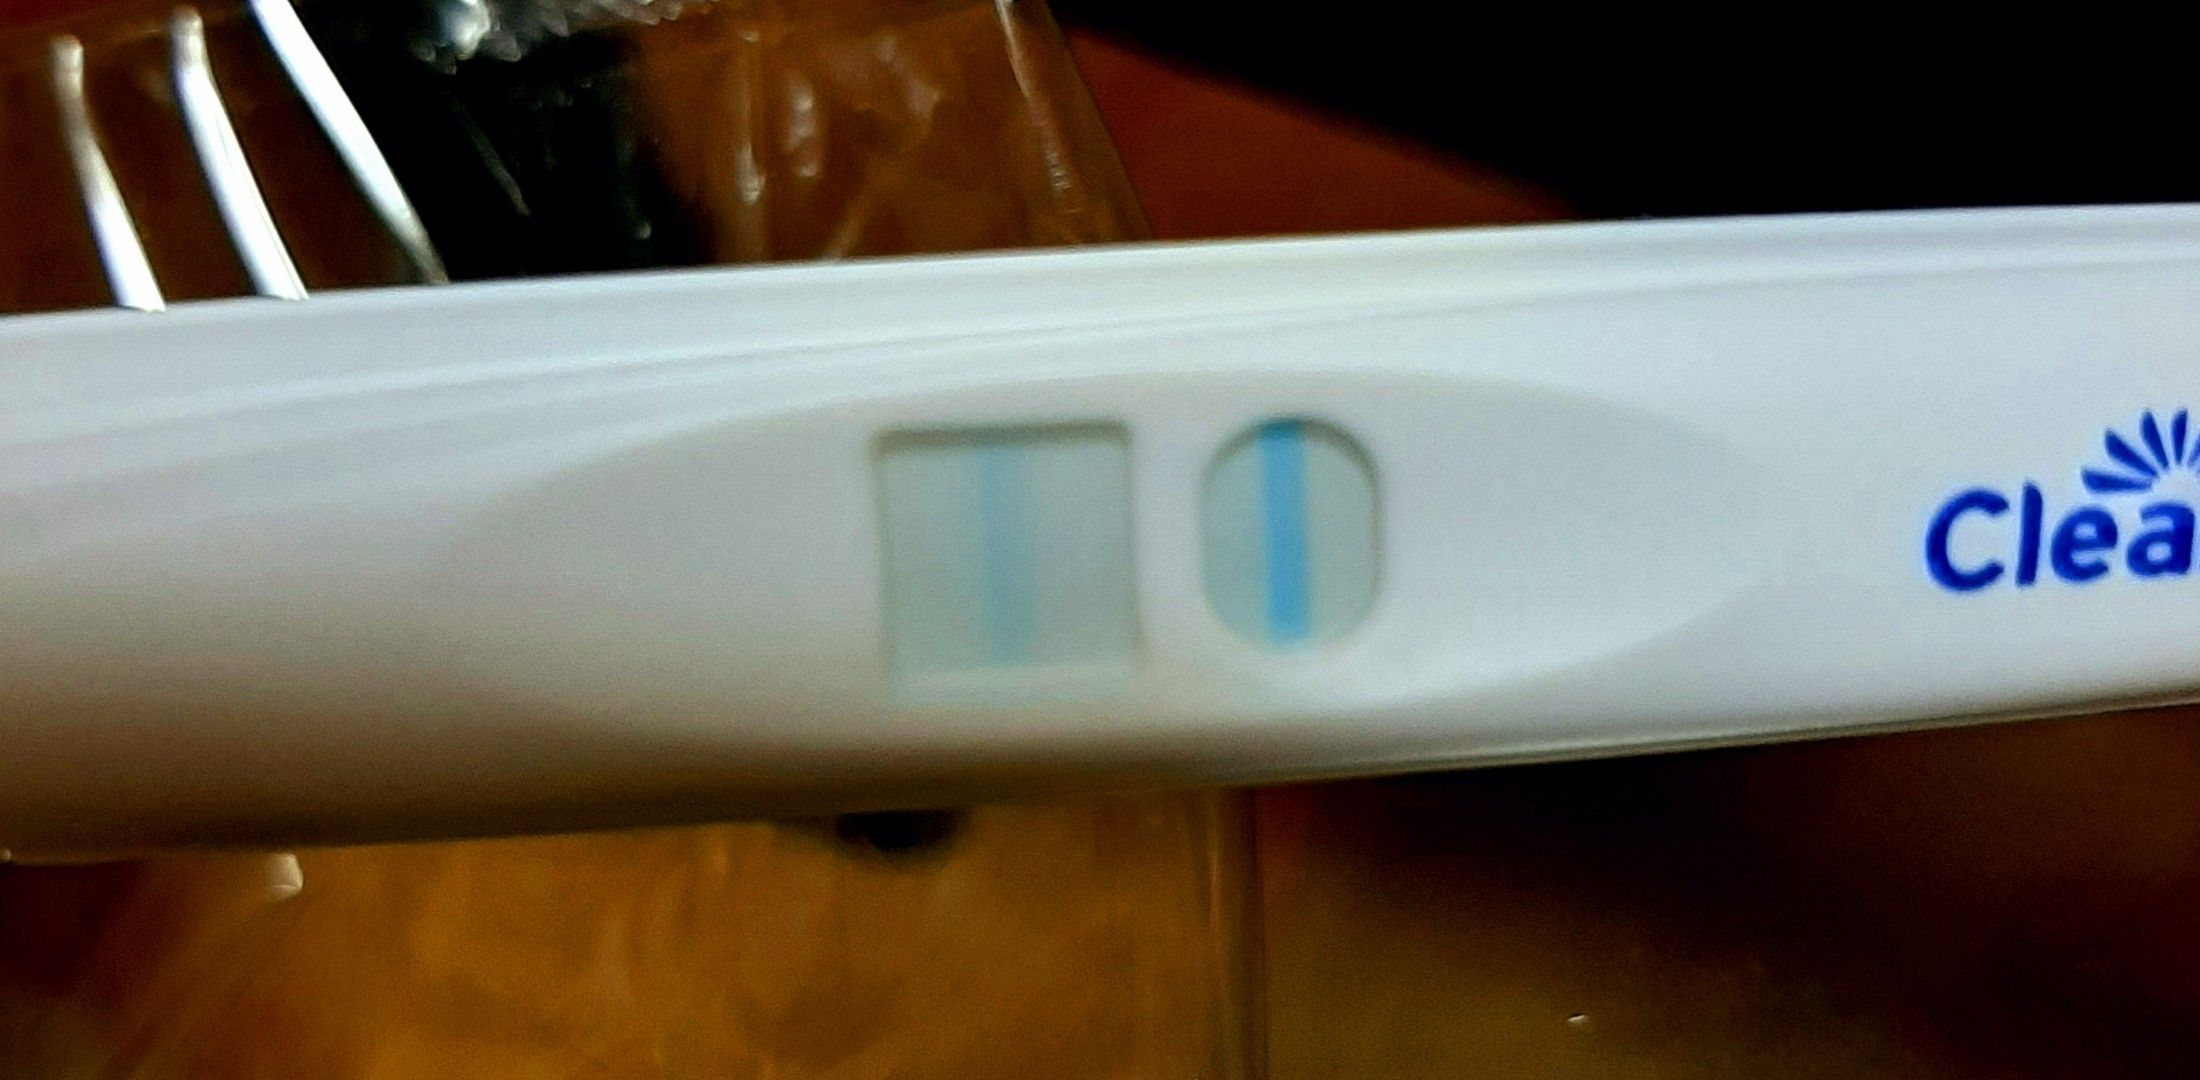 濃い 薬 妊娠 陽性 検査